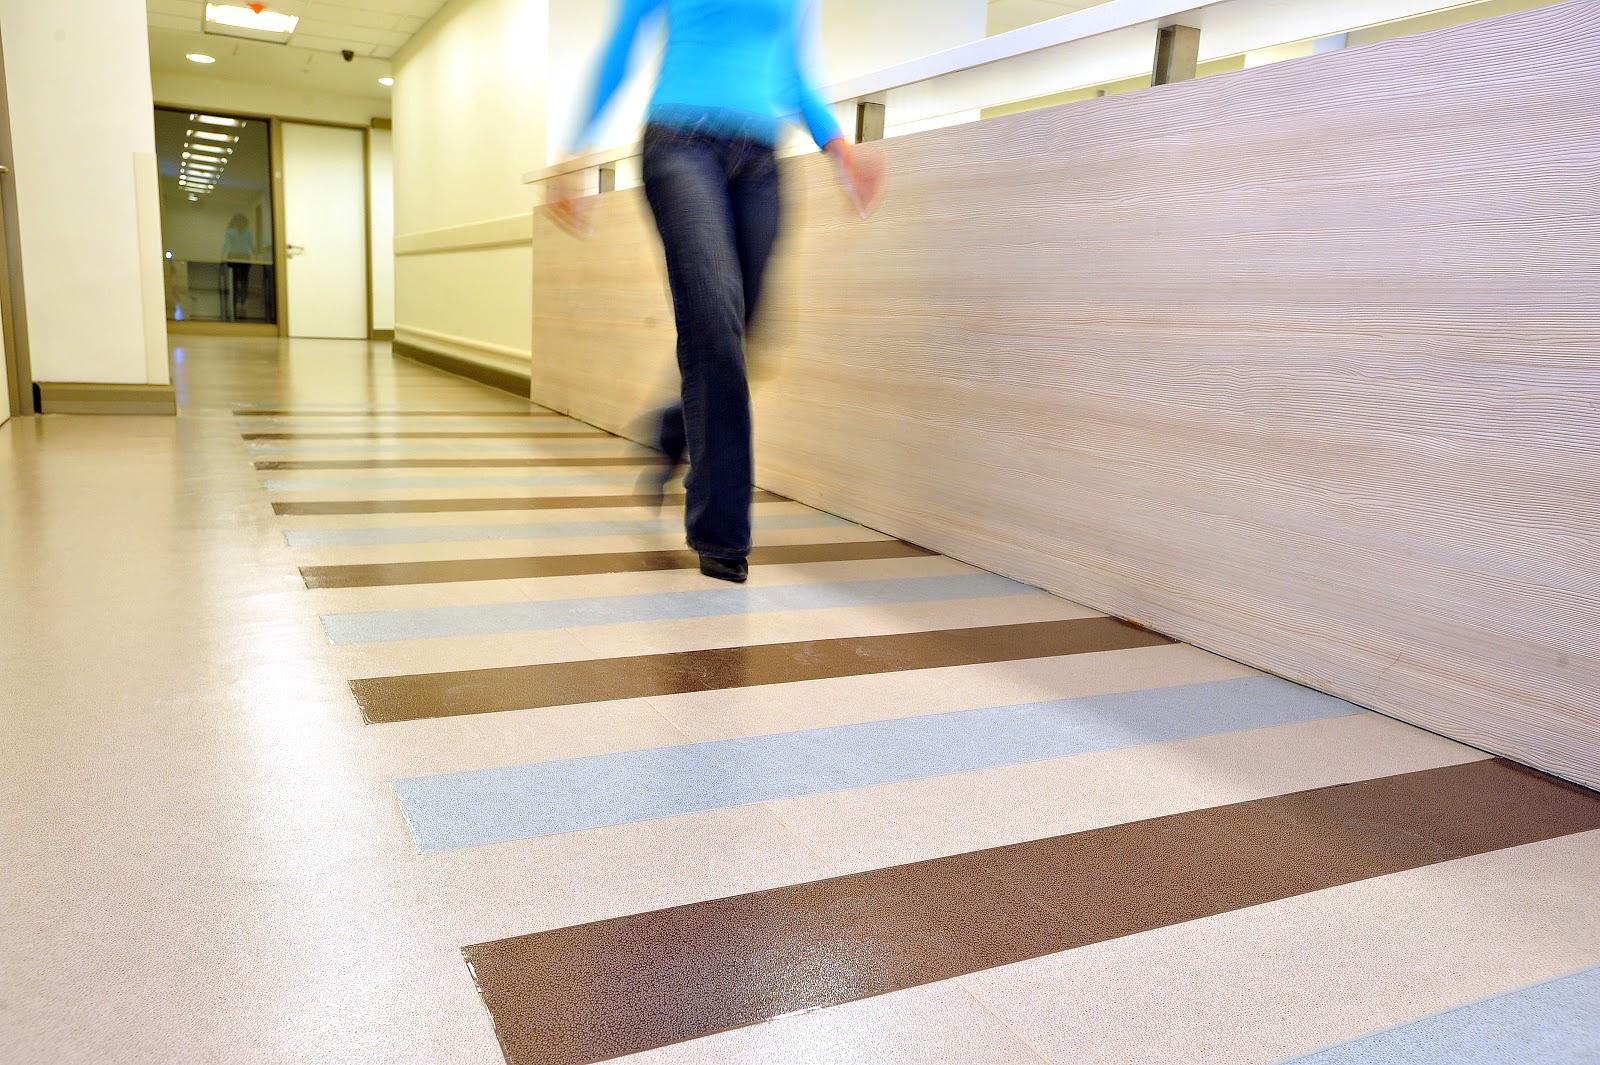 Manual de instalaci n de pavimentos mantenimiento de for Pavimentos vinilicos